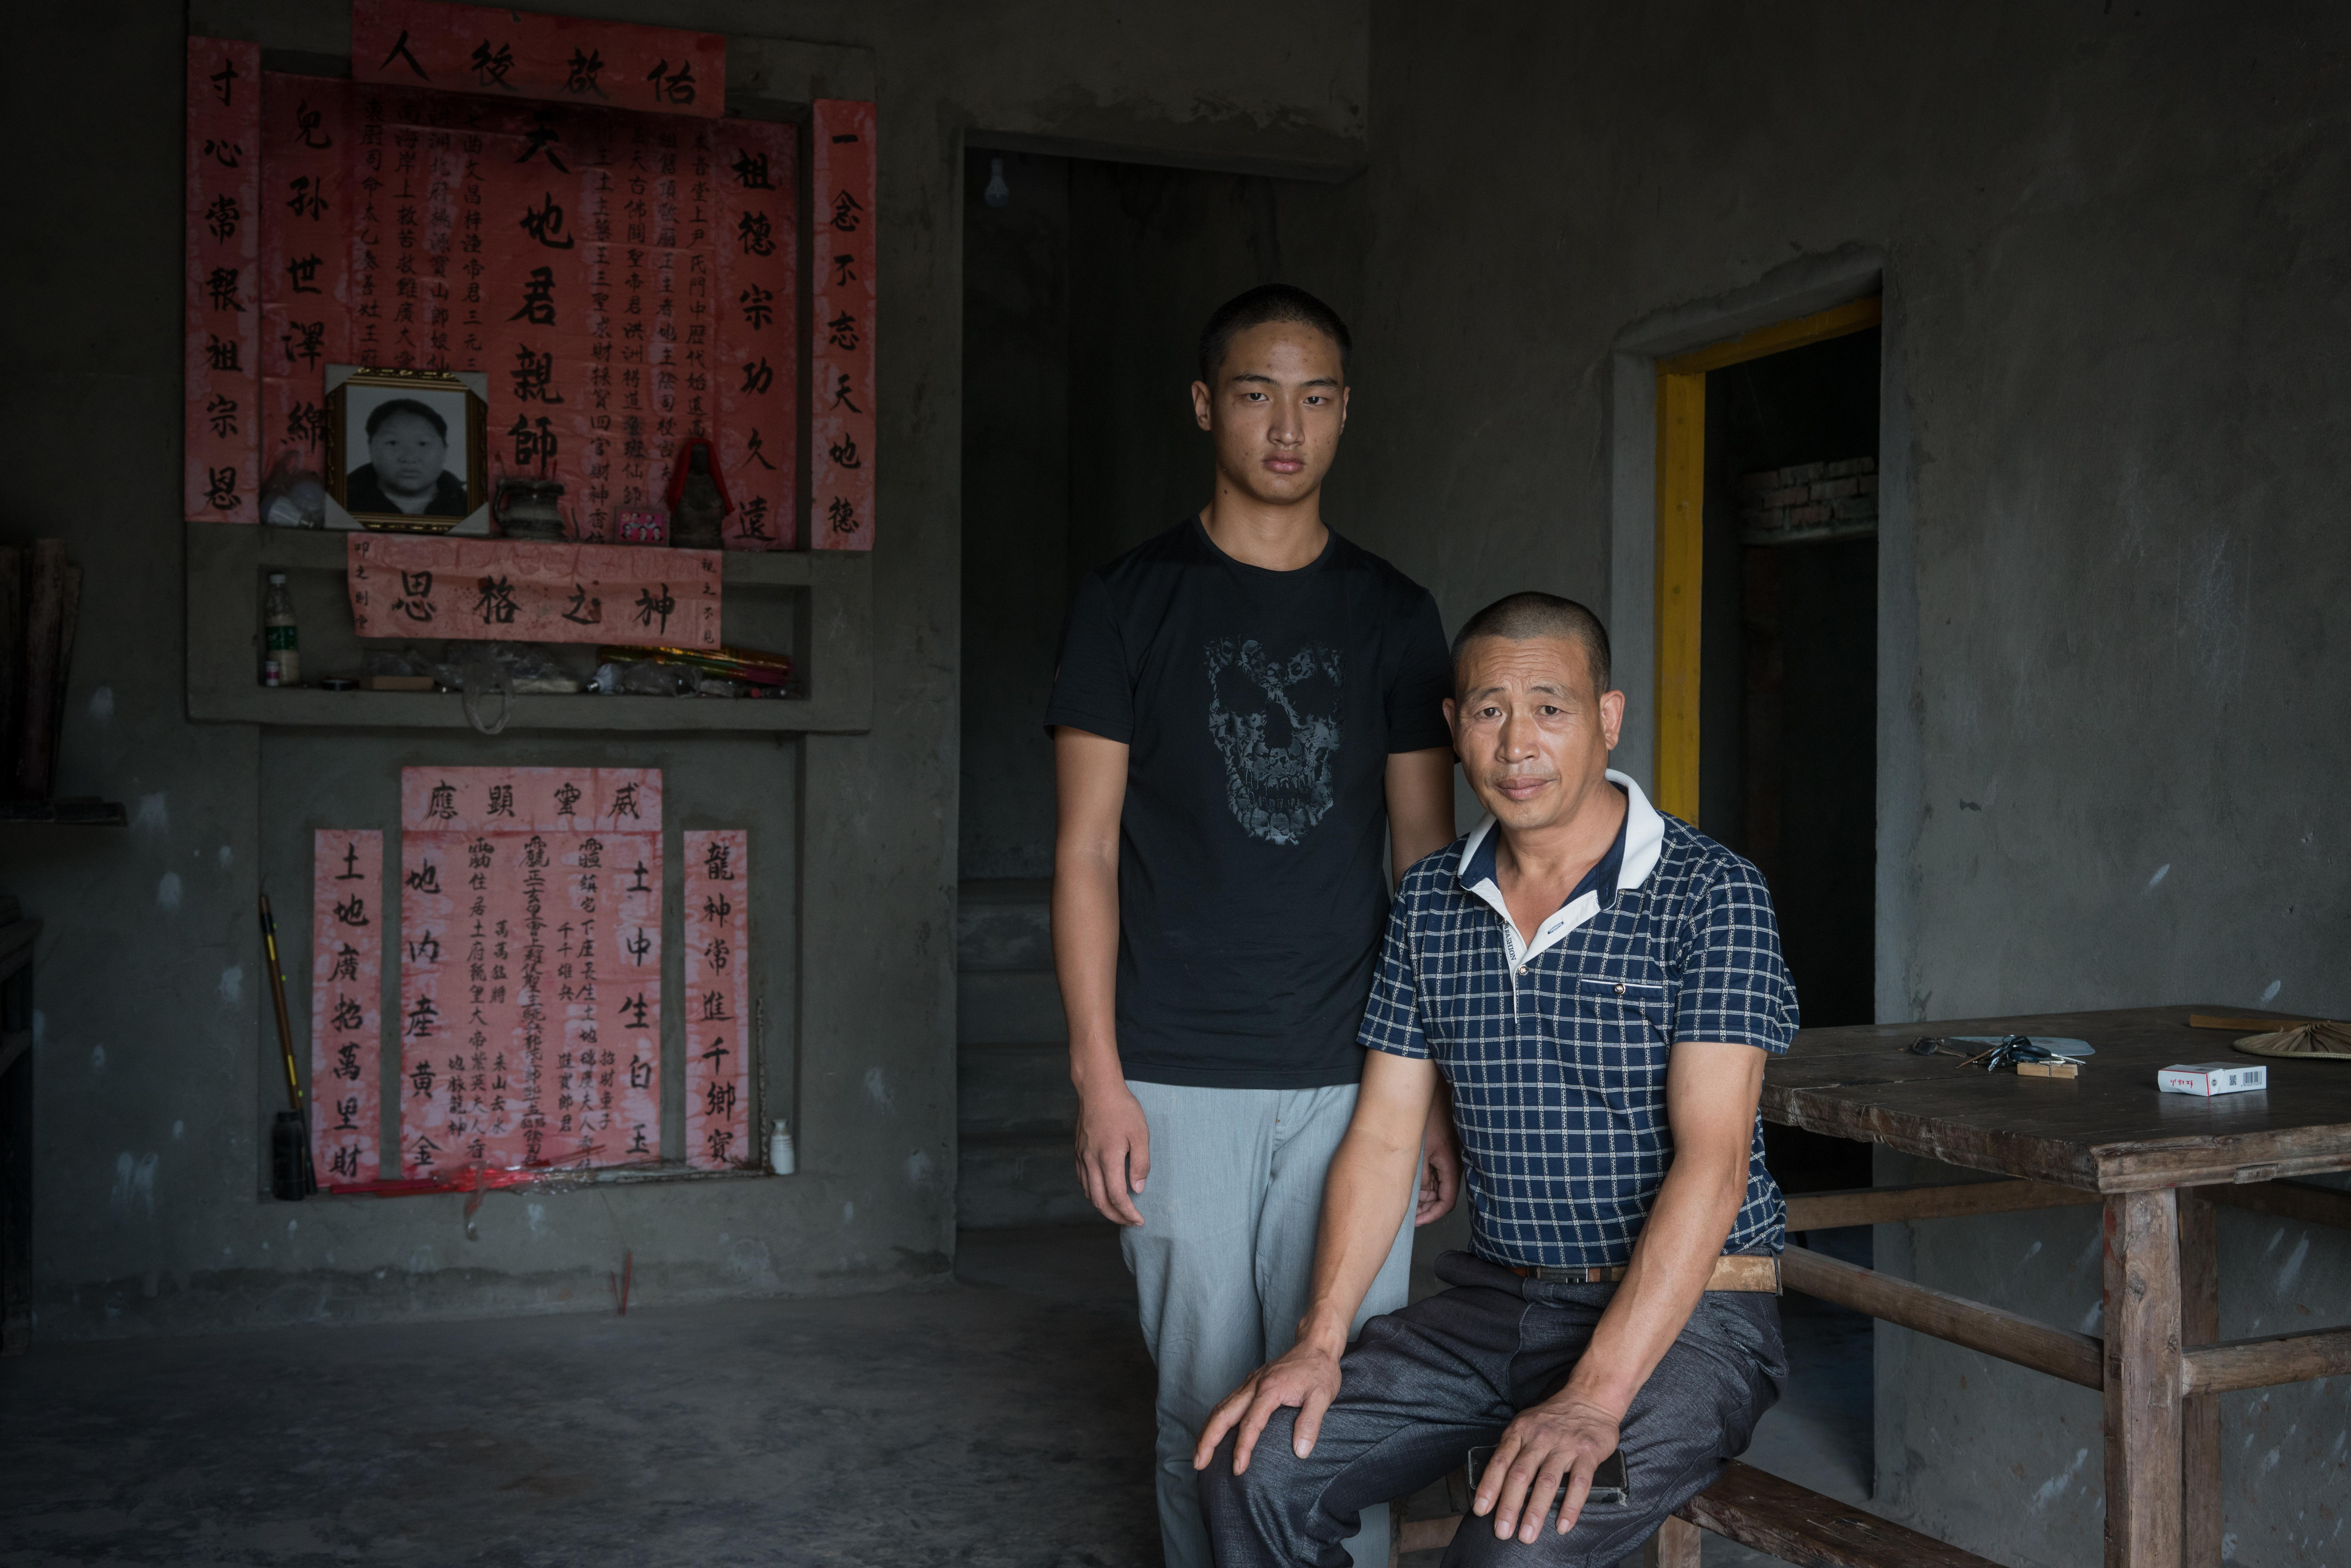 Long Yanju's death from H7N9